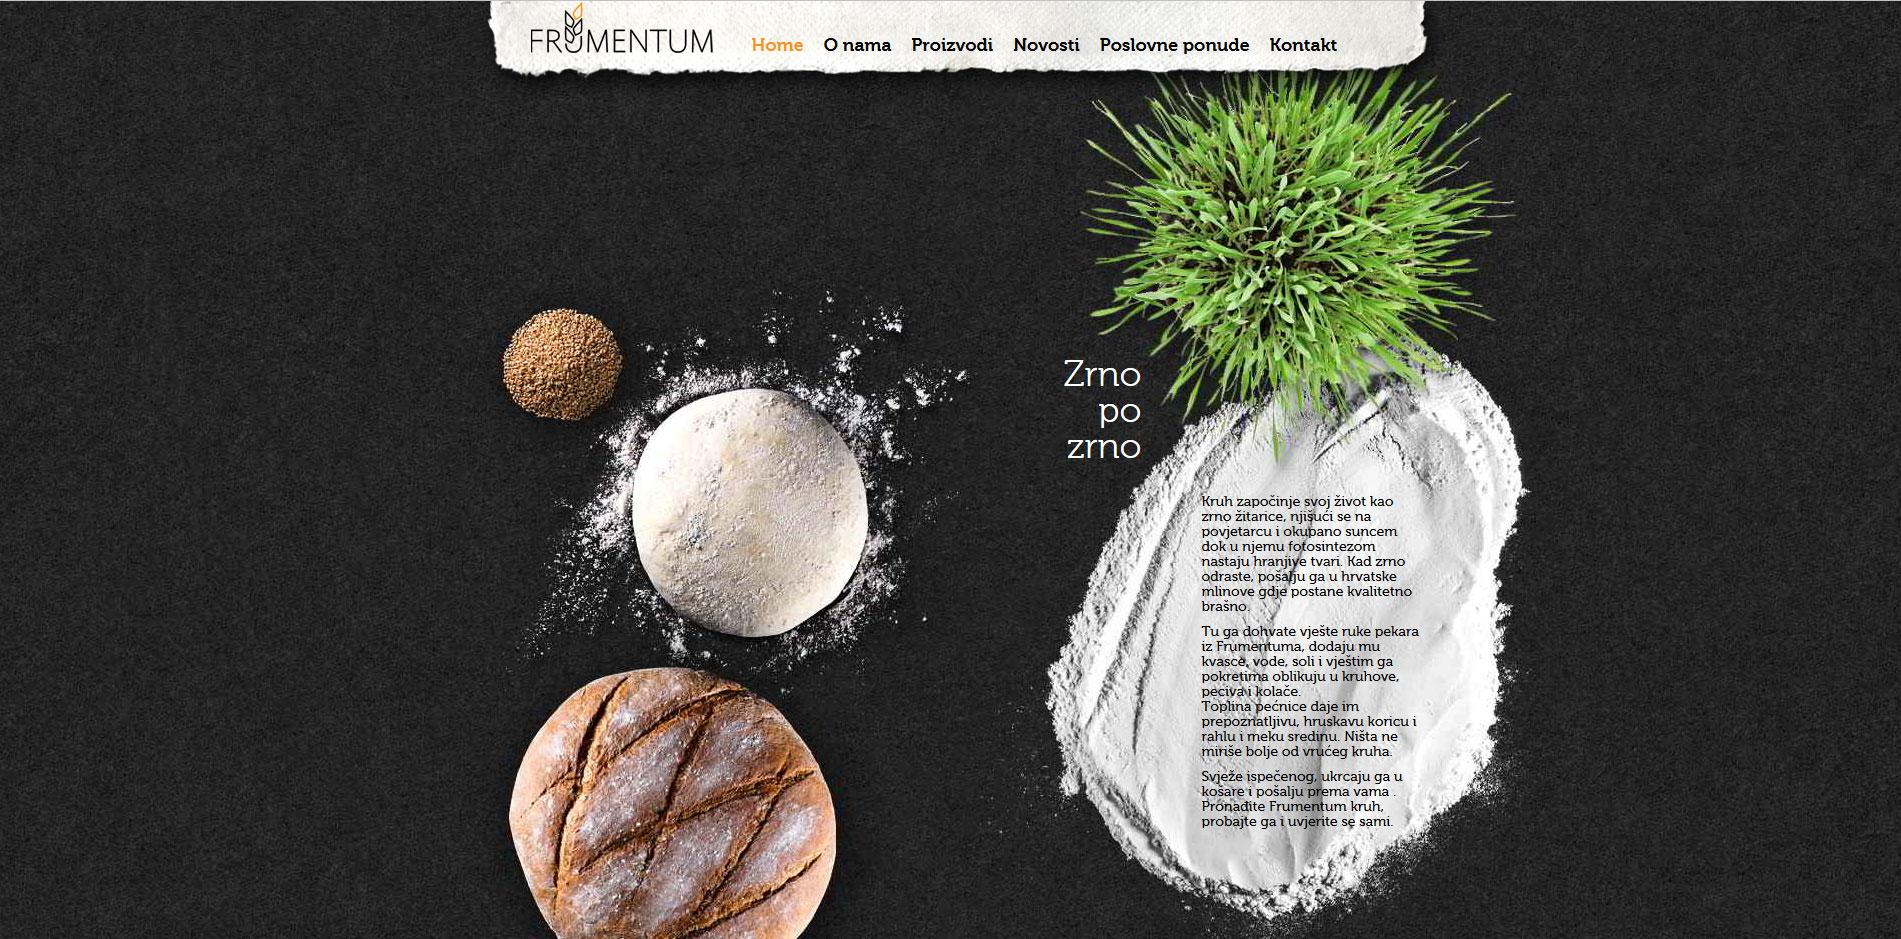 masavukmanovic.com - frumentum bakeries - branding 04